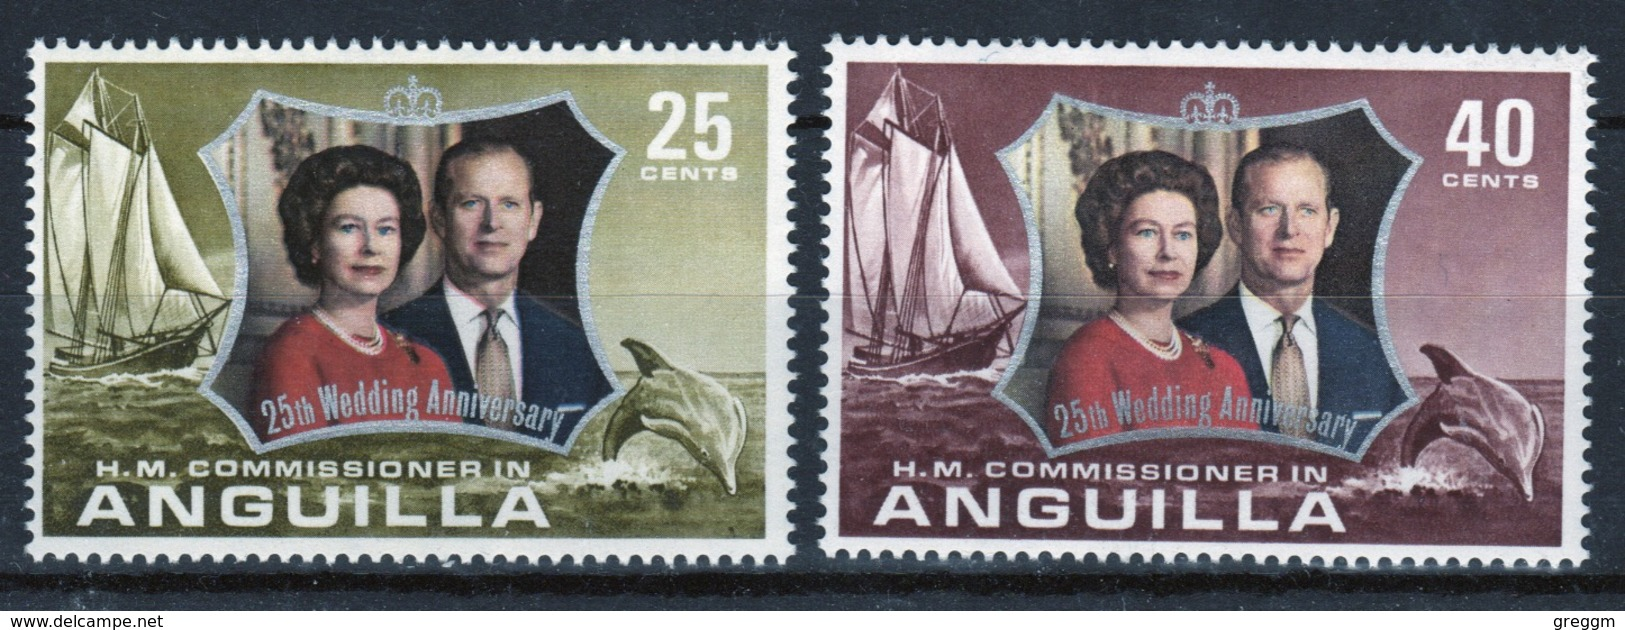 Anguilla Set Of Stamps To Celebrate 25th Wedding Anniversary. - Anguilla (1968-...)